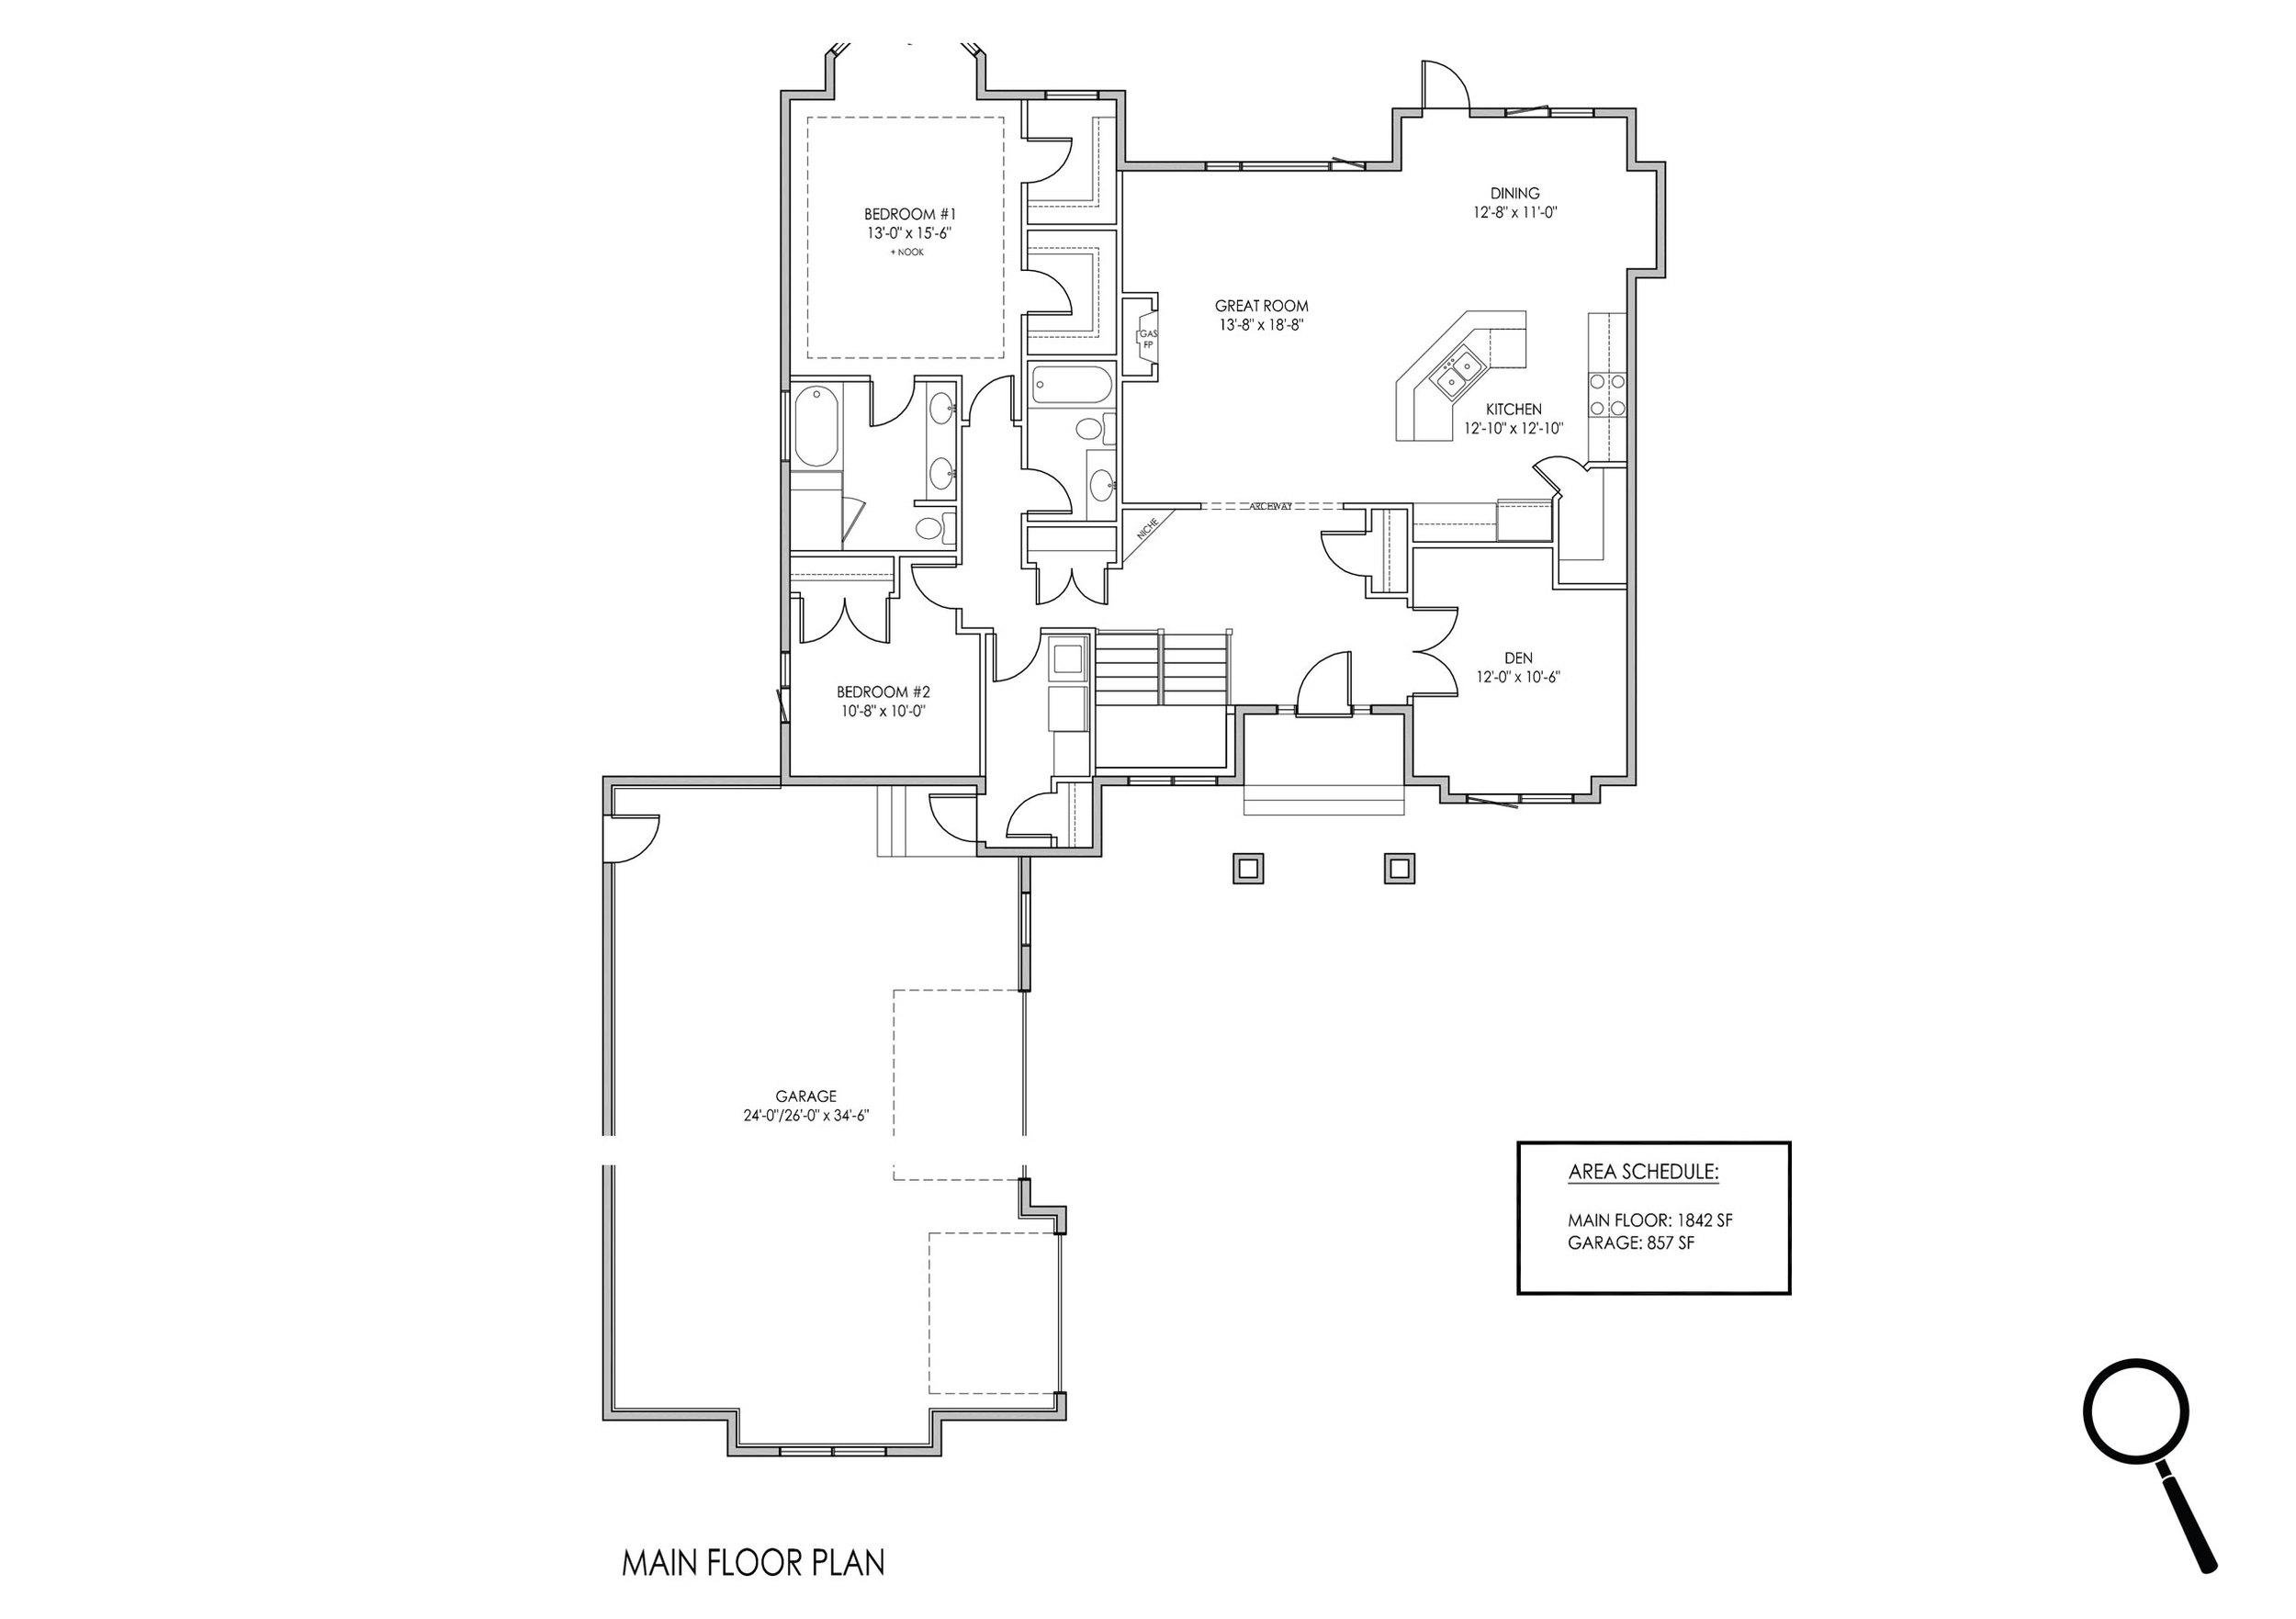 MagnifyingGlass-Floorplan28_501CartwrightSt.png